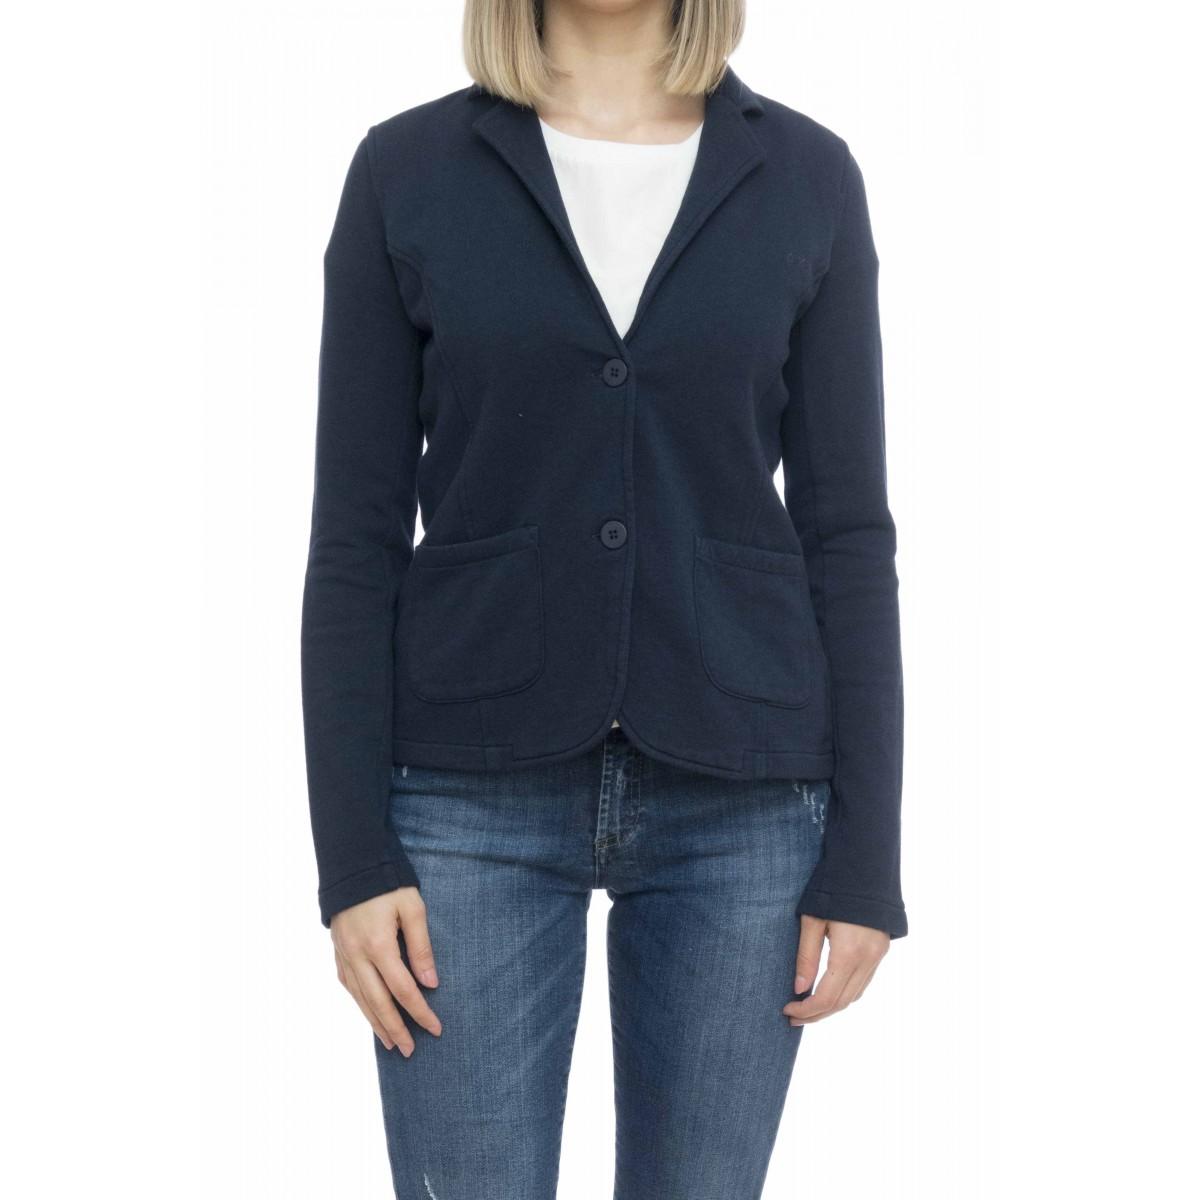 Felpa donna - F19205 giacchina felpa